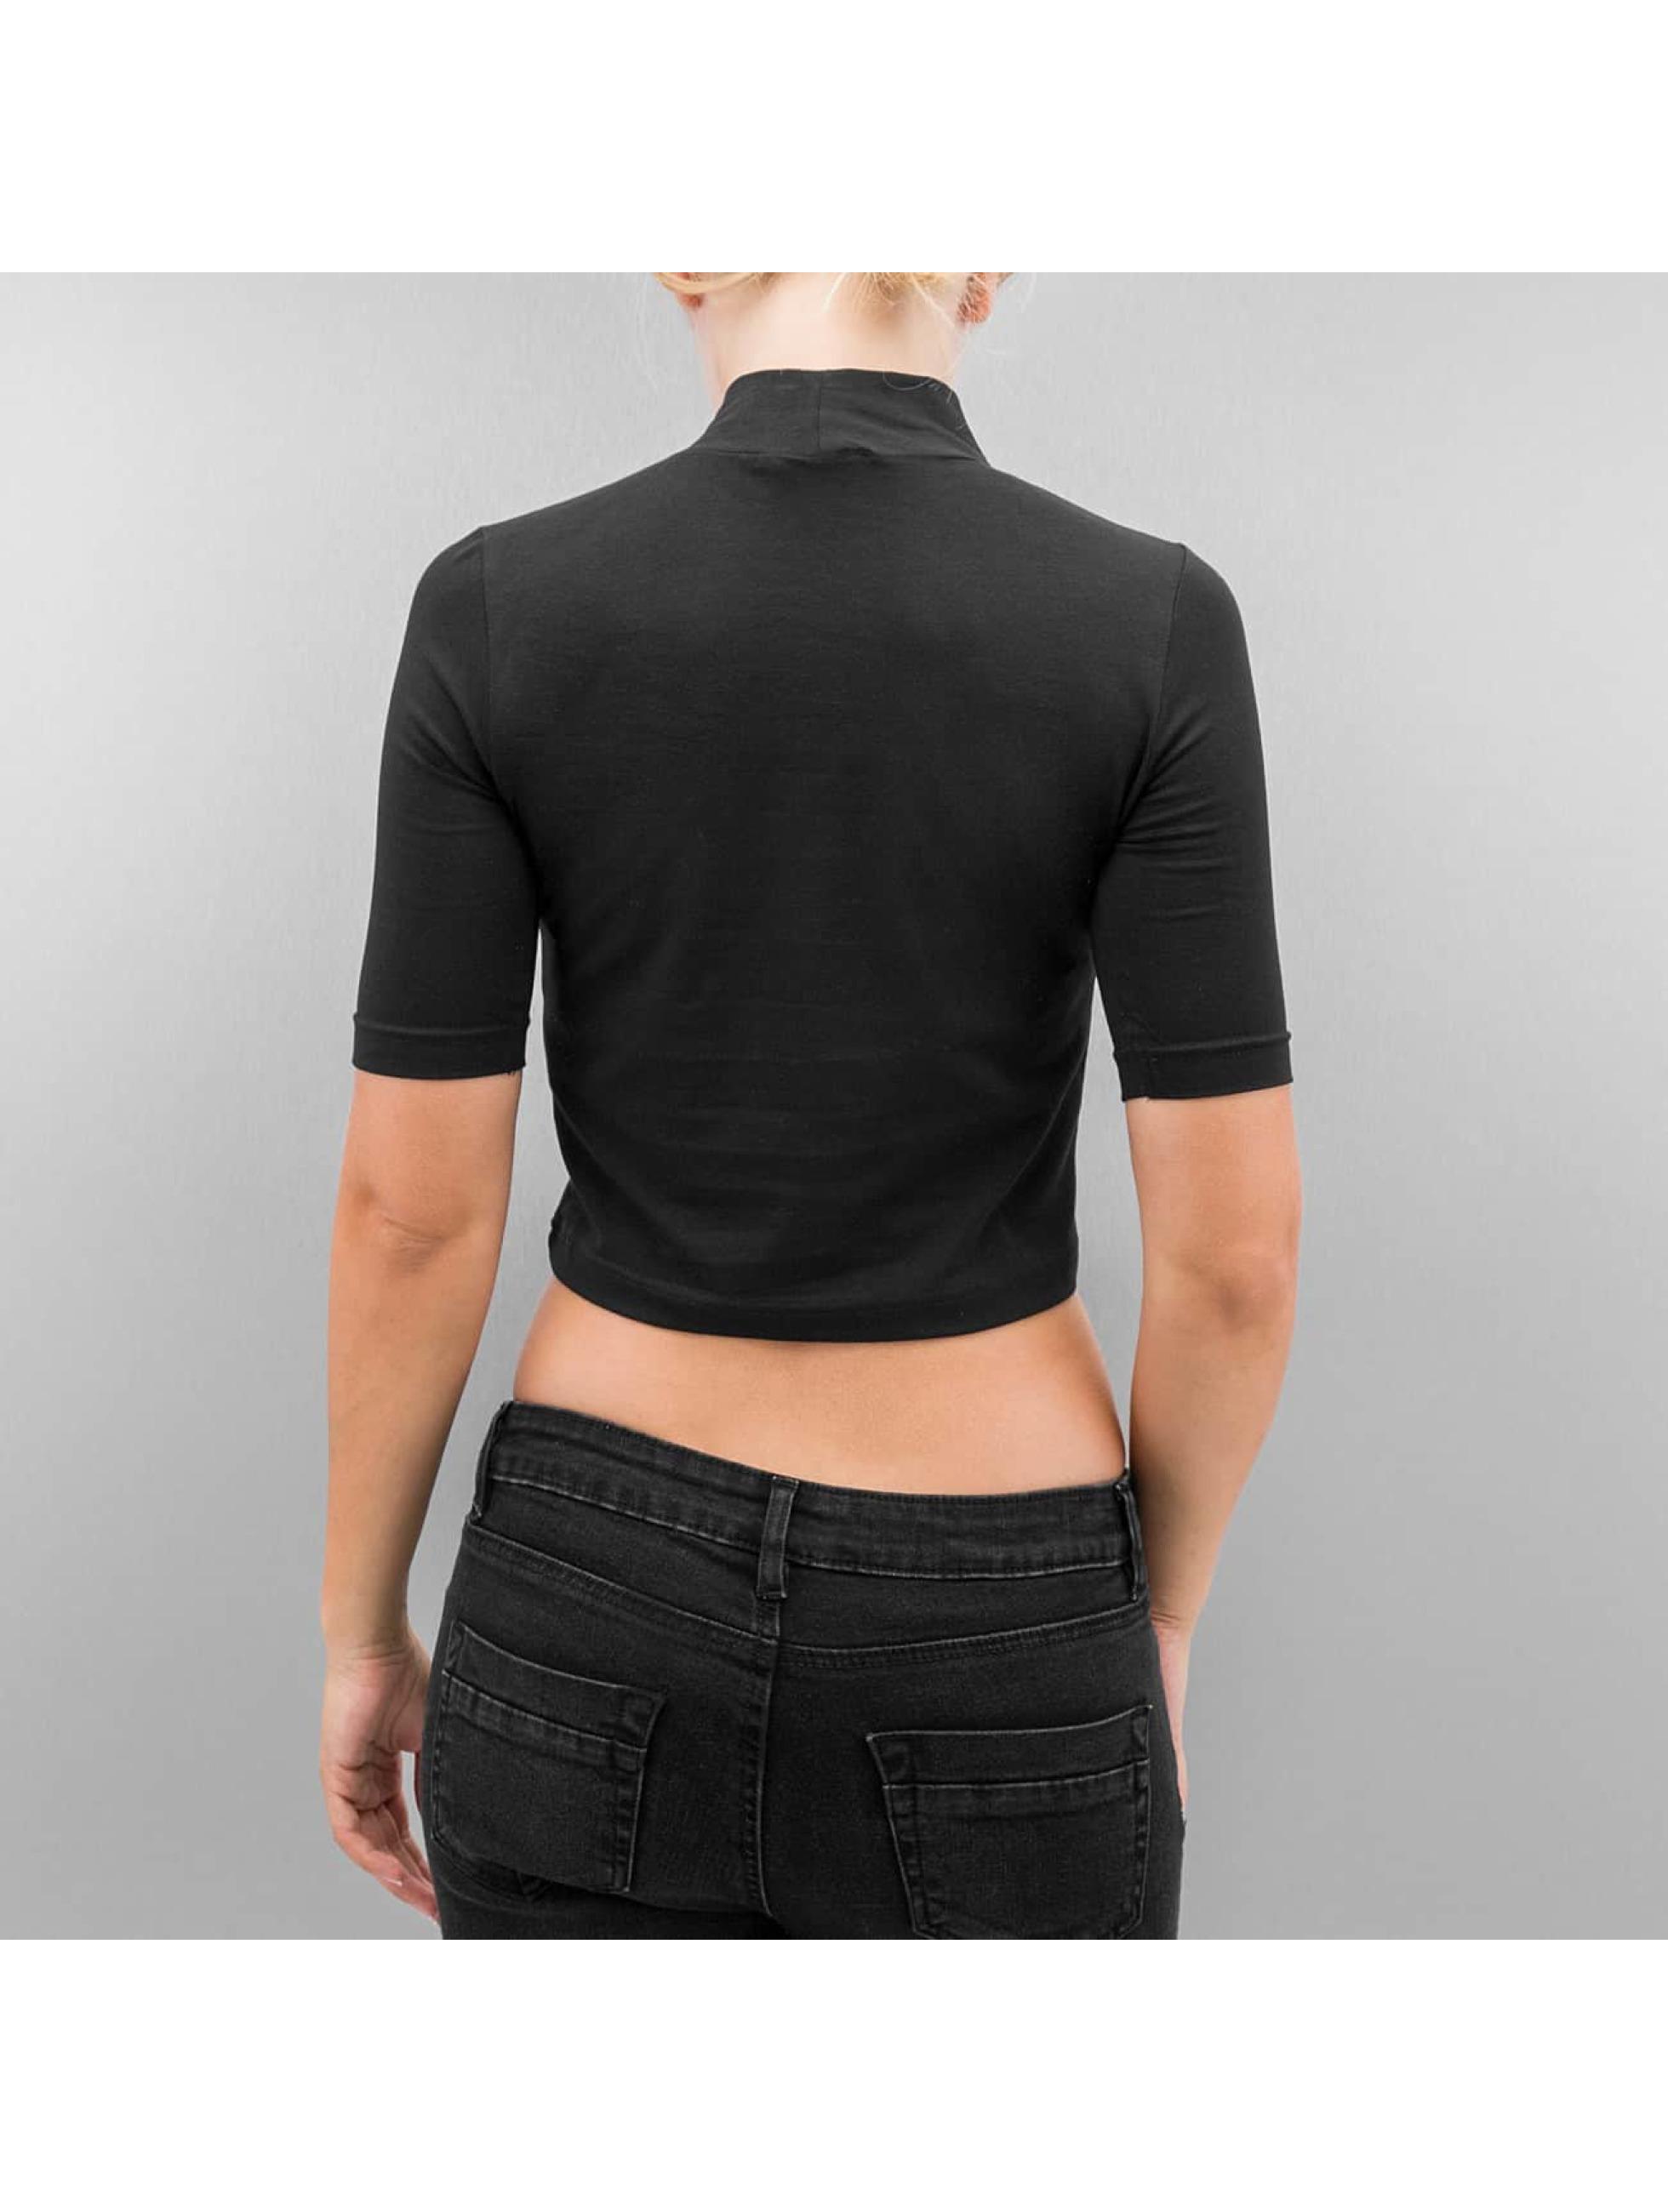 Urban Classics T-Shirt Cropped Turtleneck schwarz